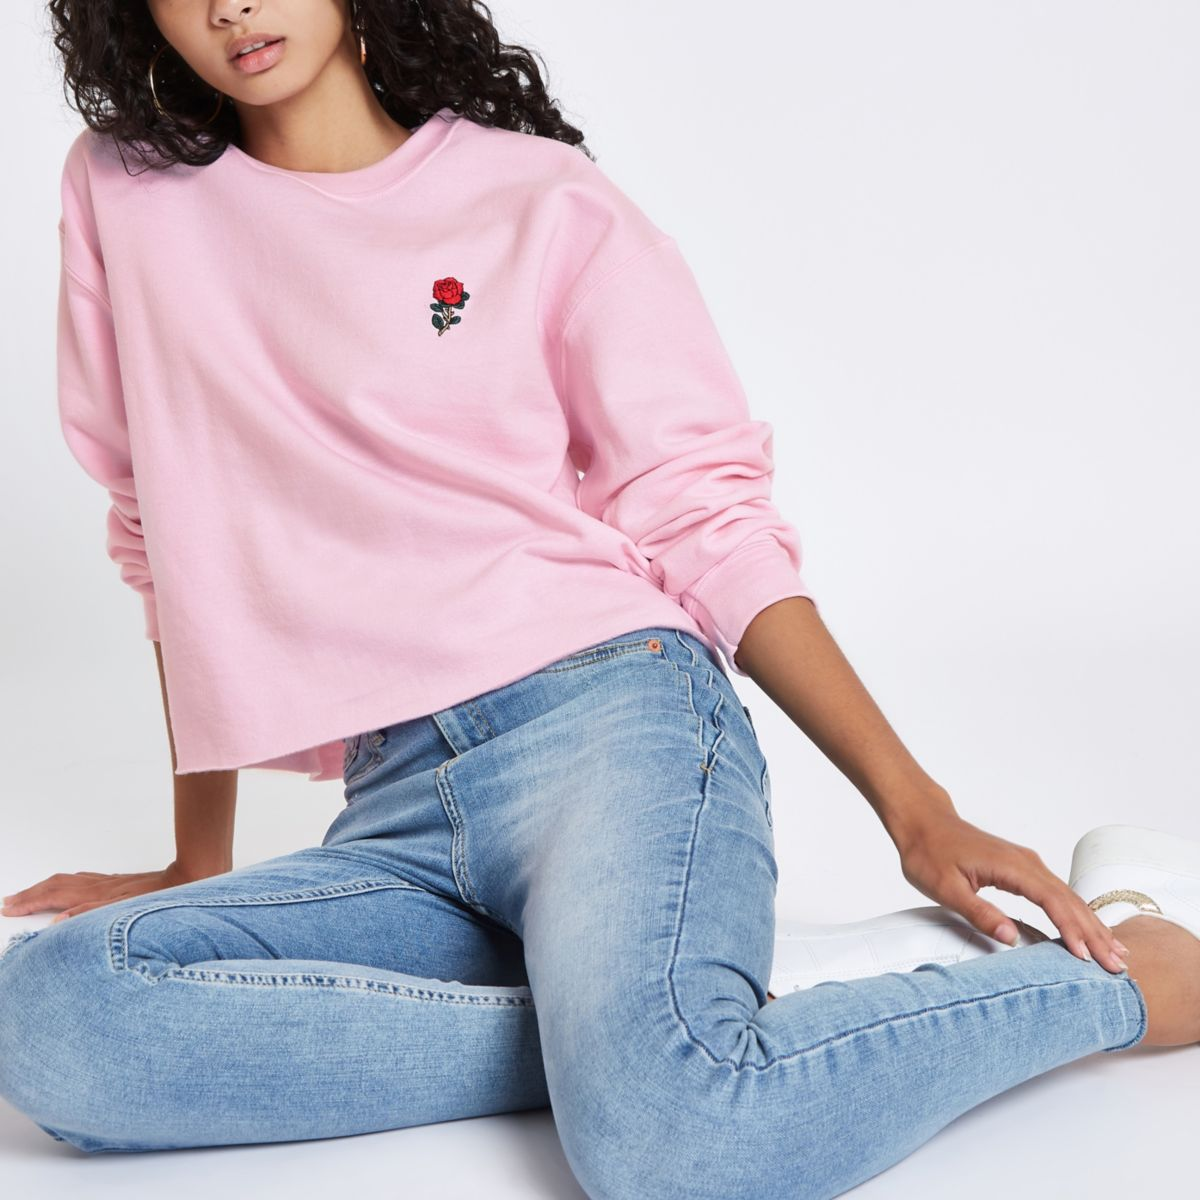 Pink rose embroidered sweatshirt